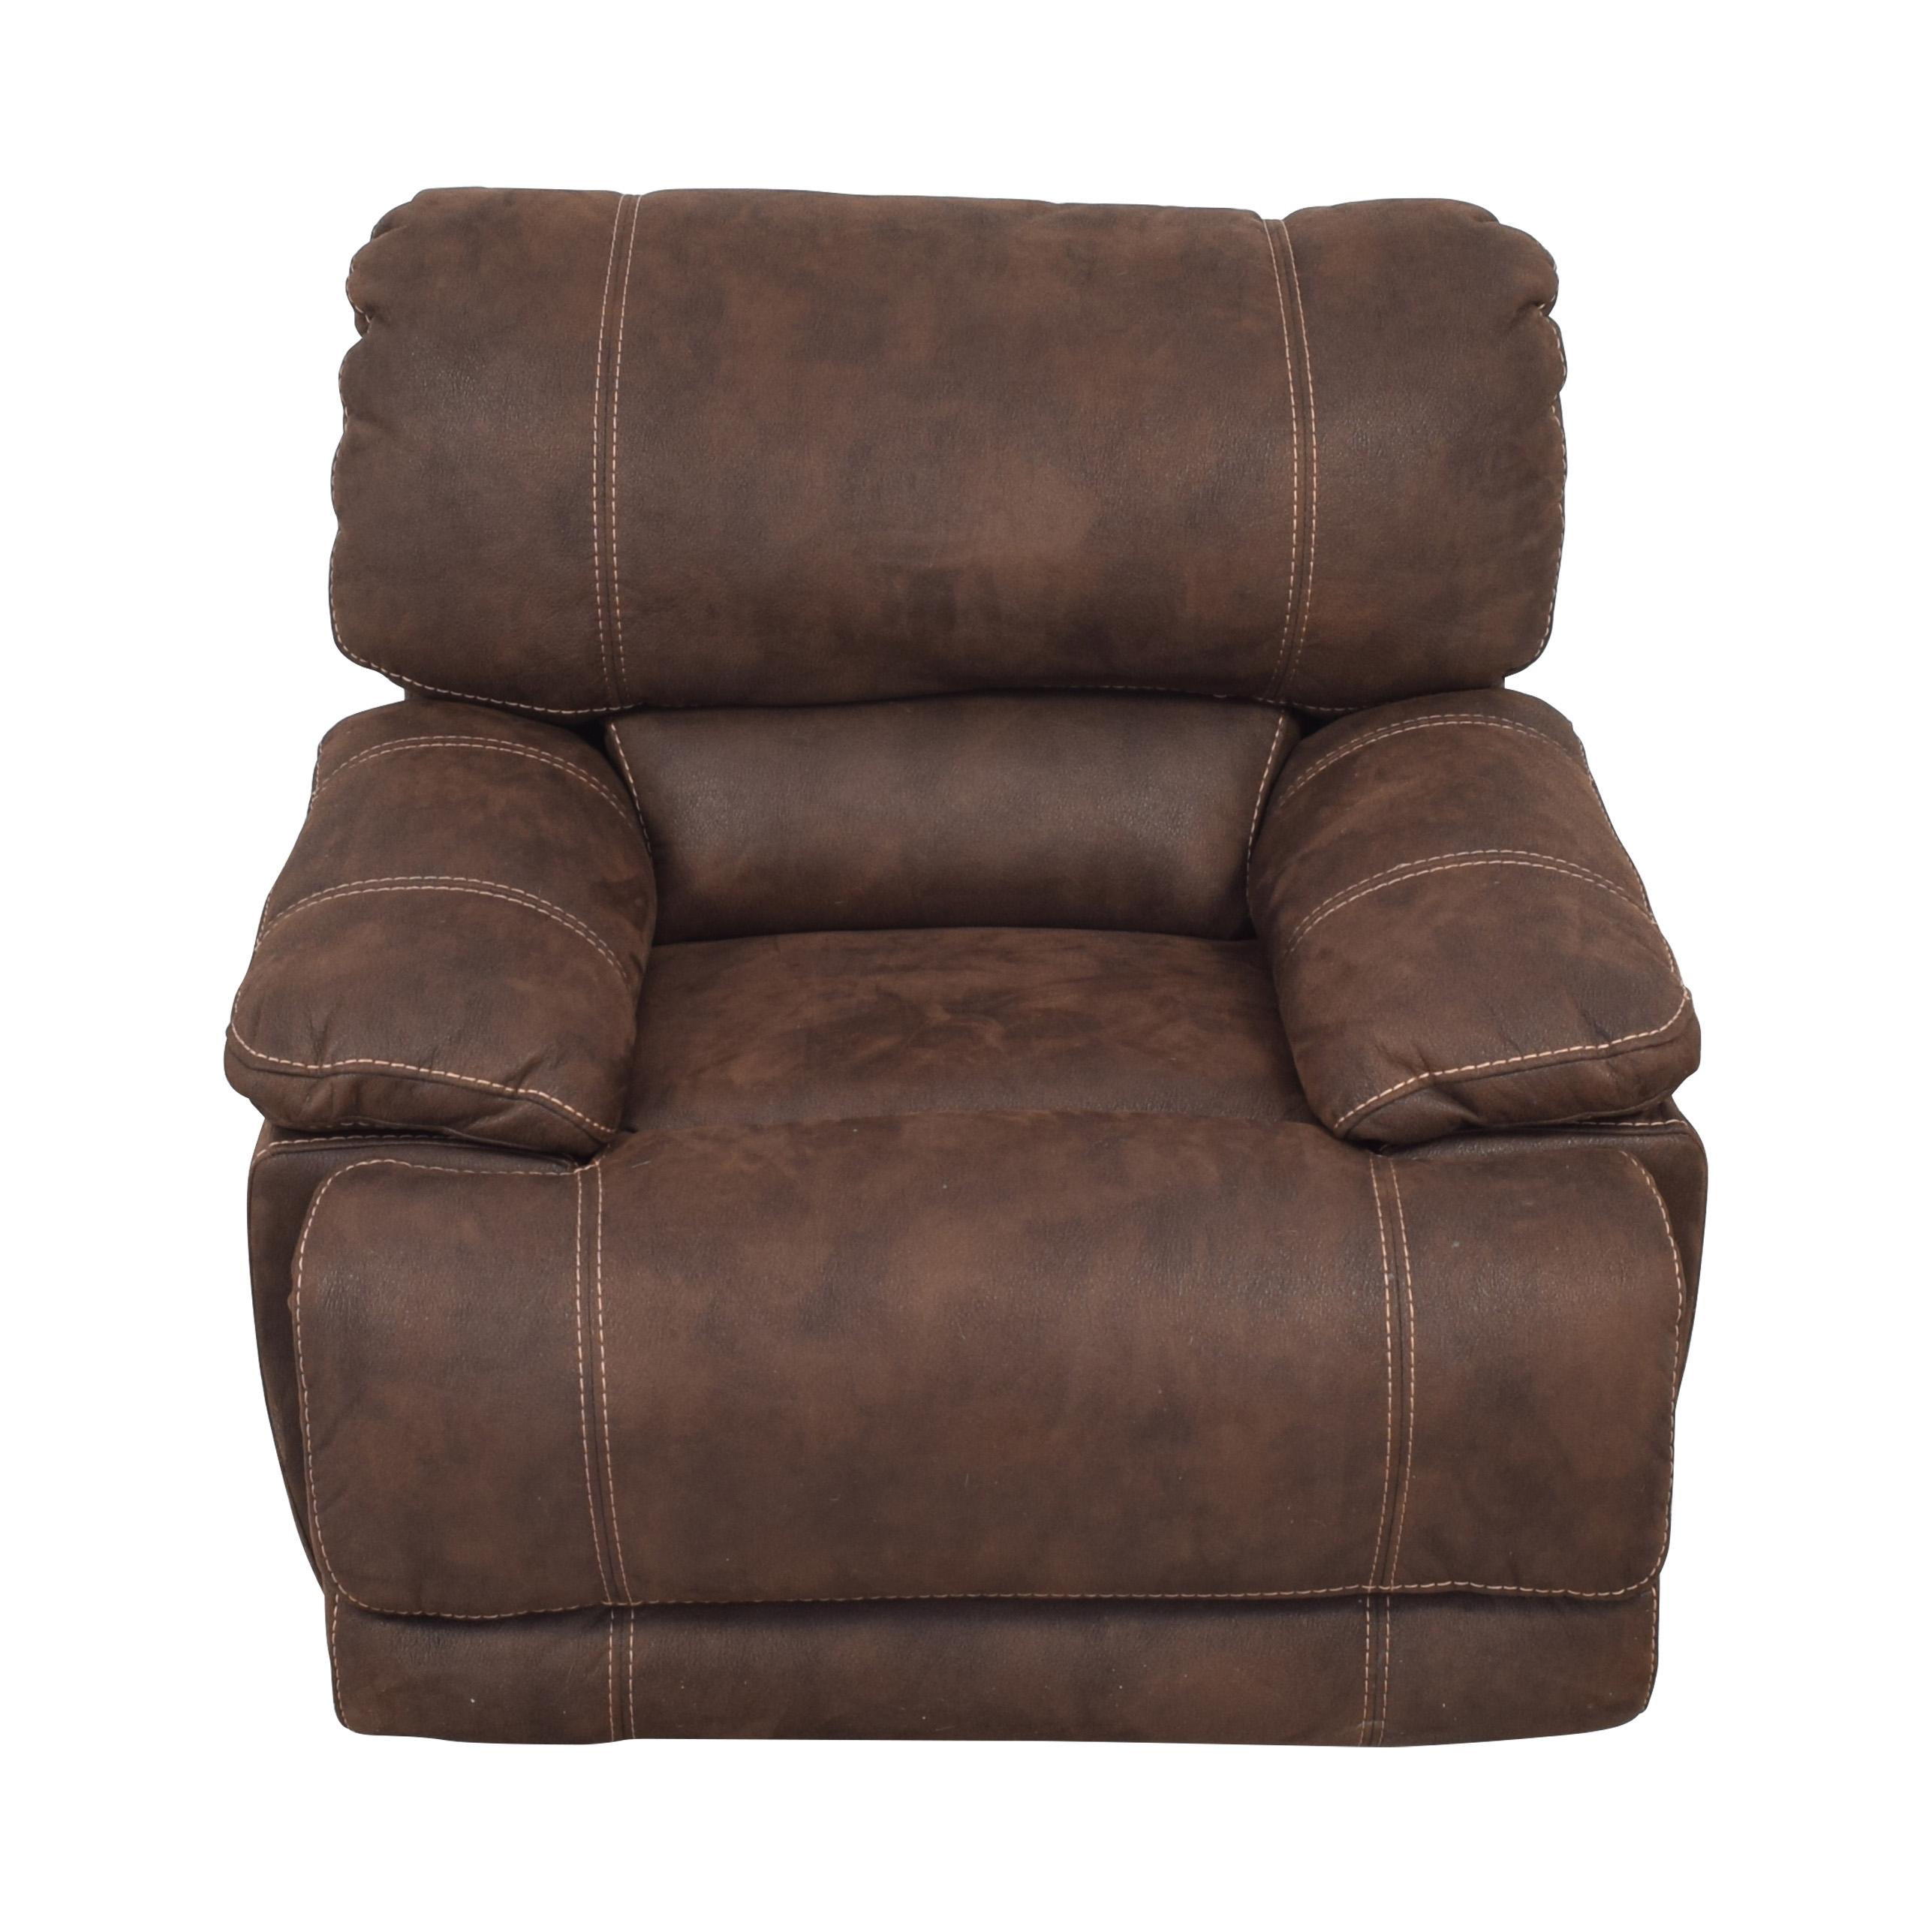 Macy's Macy's Upholstered Recliner pa